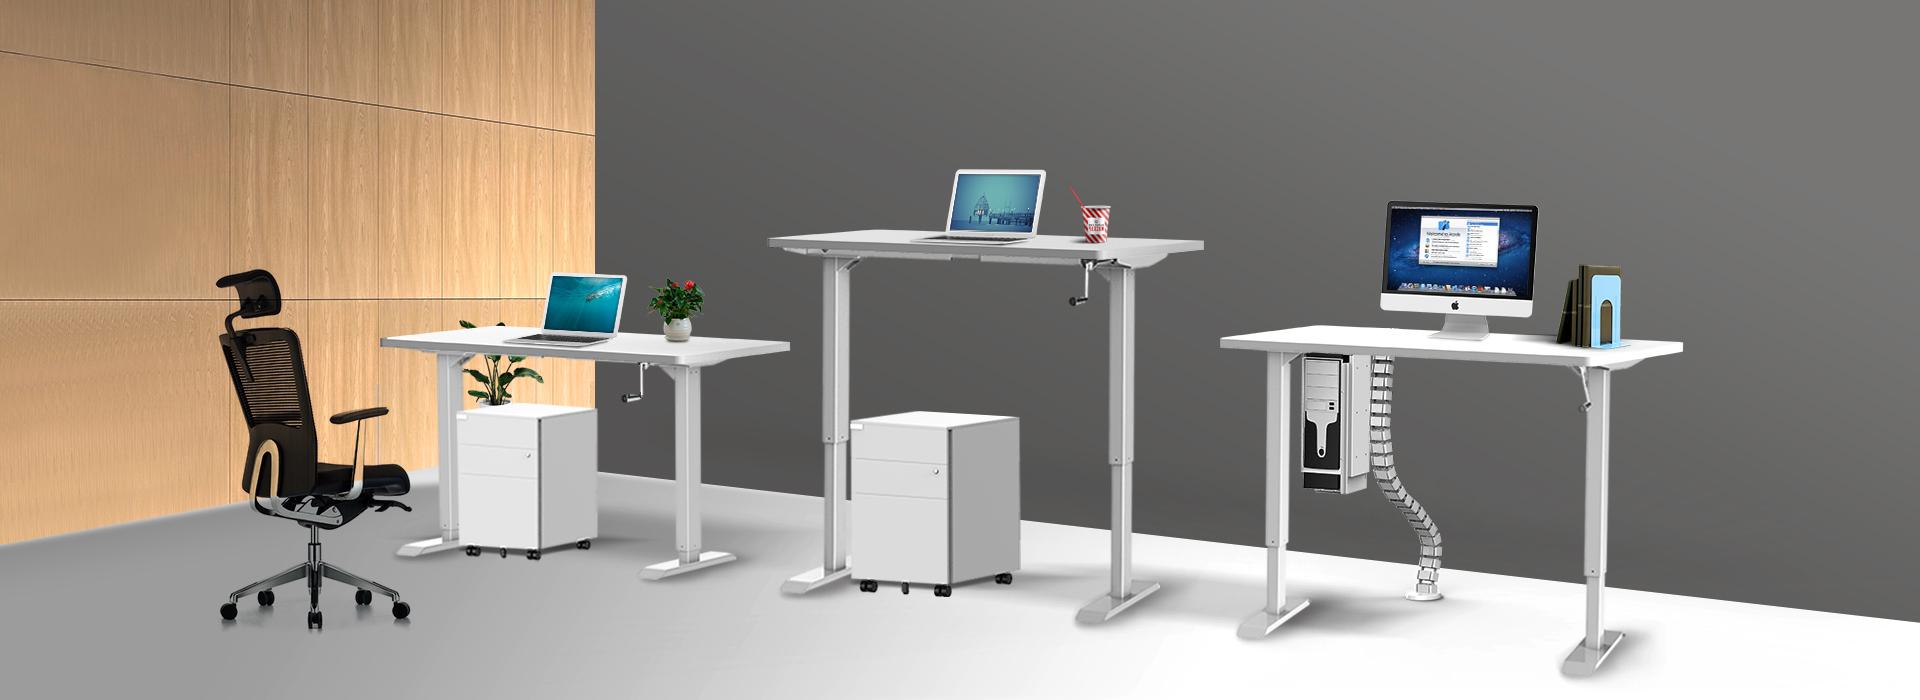 Edesk Ergologic Manual Height Adjustable Desk India Mumbai